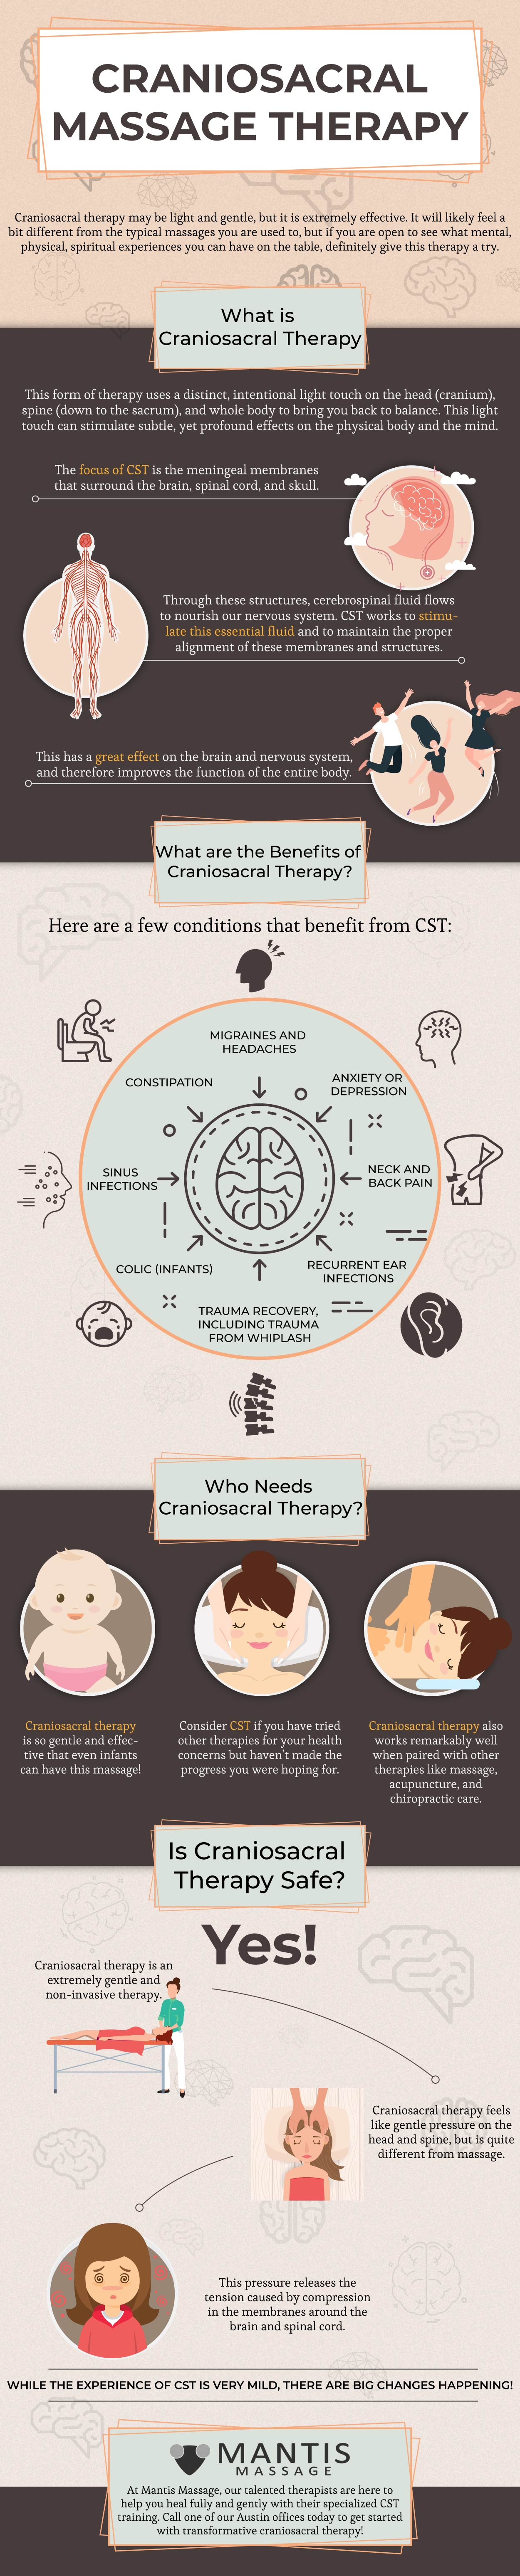 Mantis Massage_Craniosacral Massage Therapy.jpg